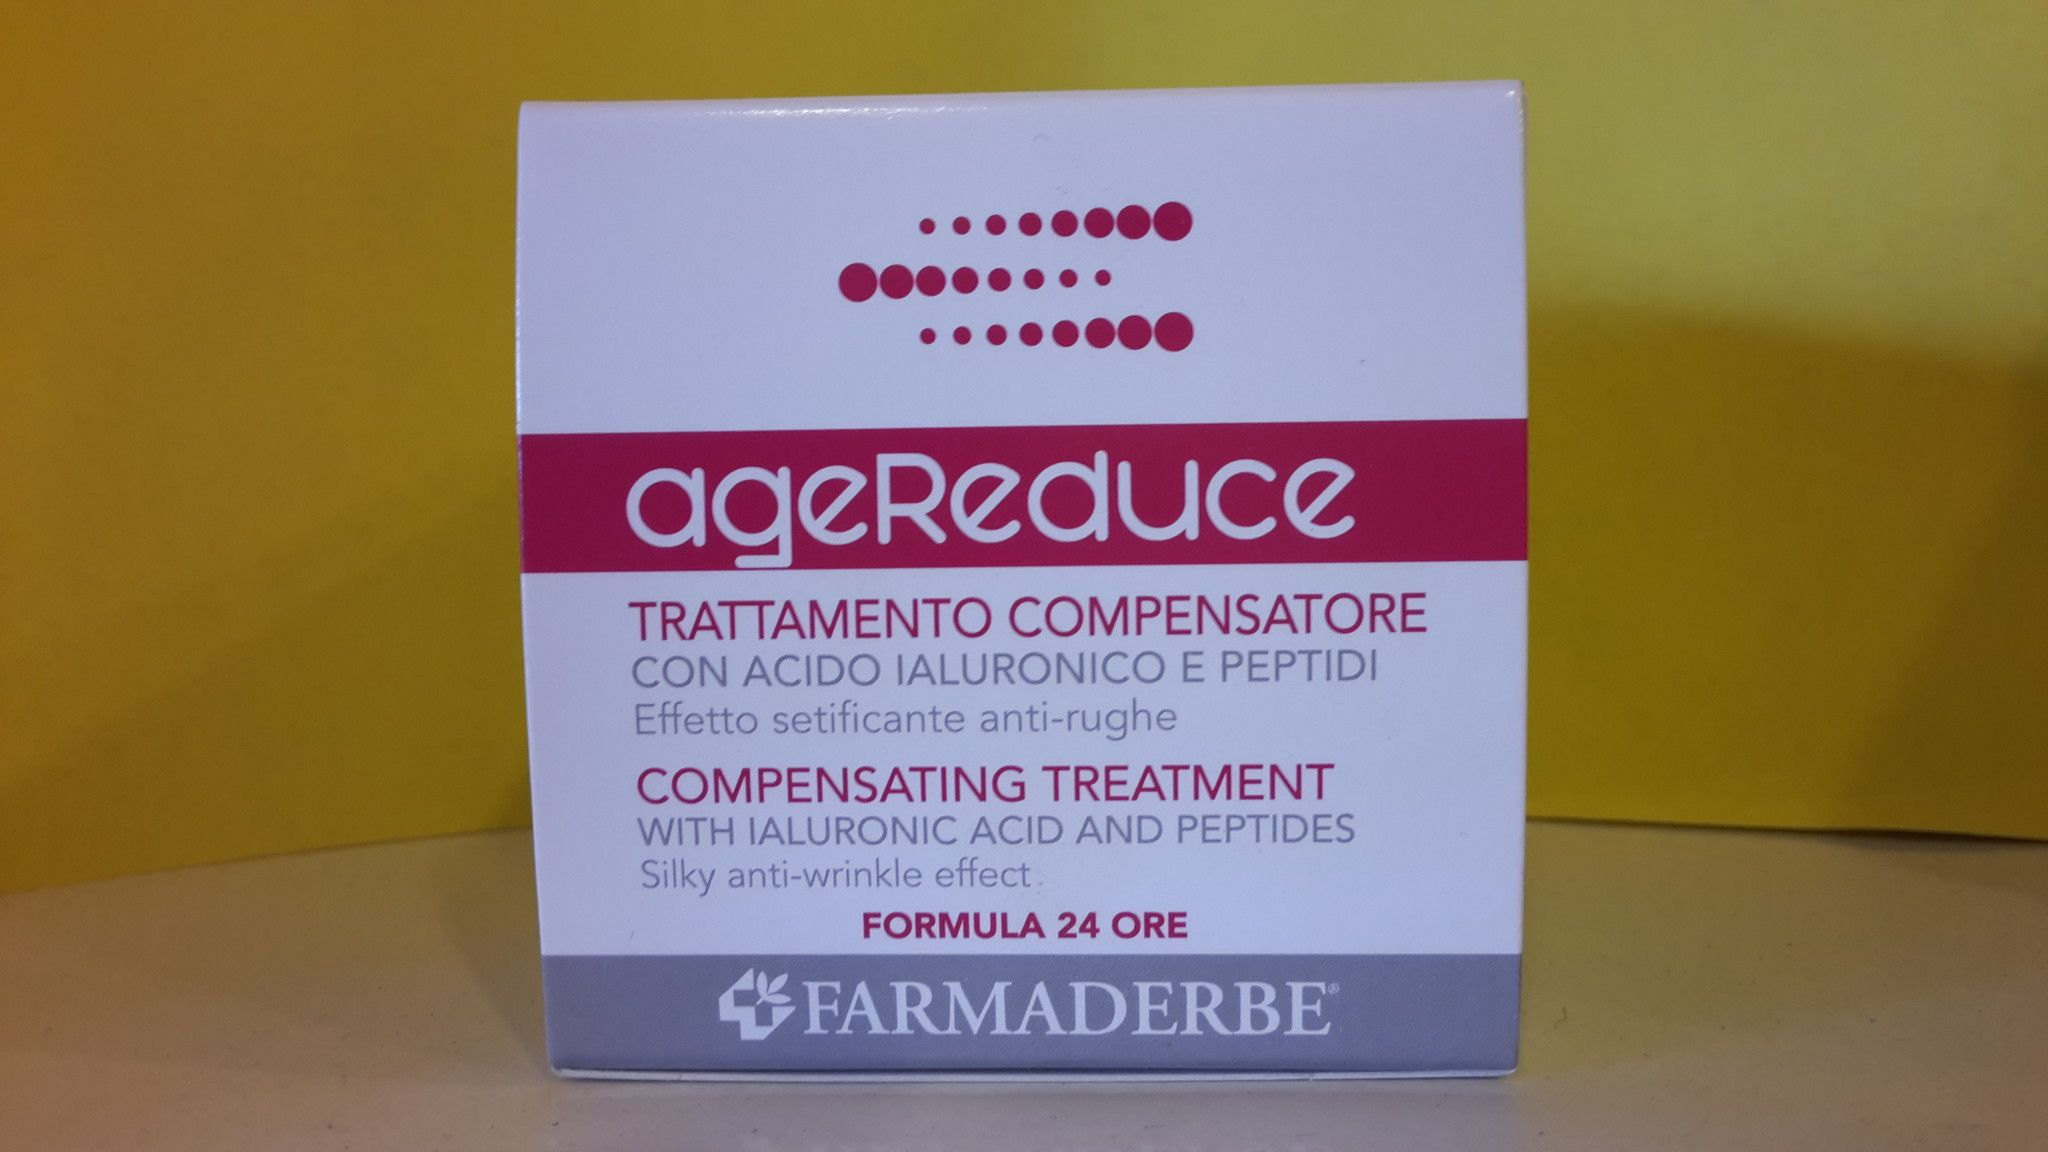 AgeReduce Crema ANTIRUGHE -  24  Ore - 50 ml- FARMADERBE